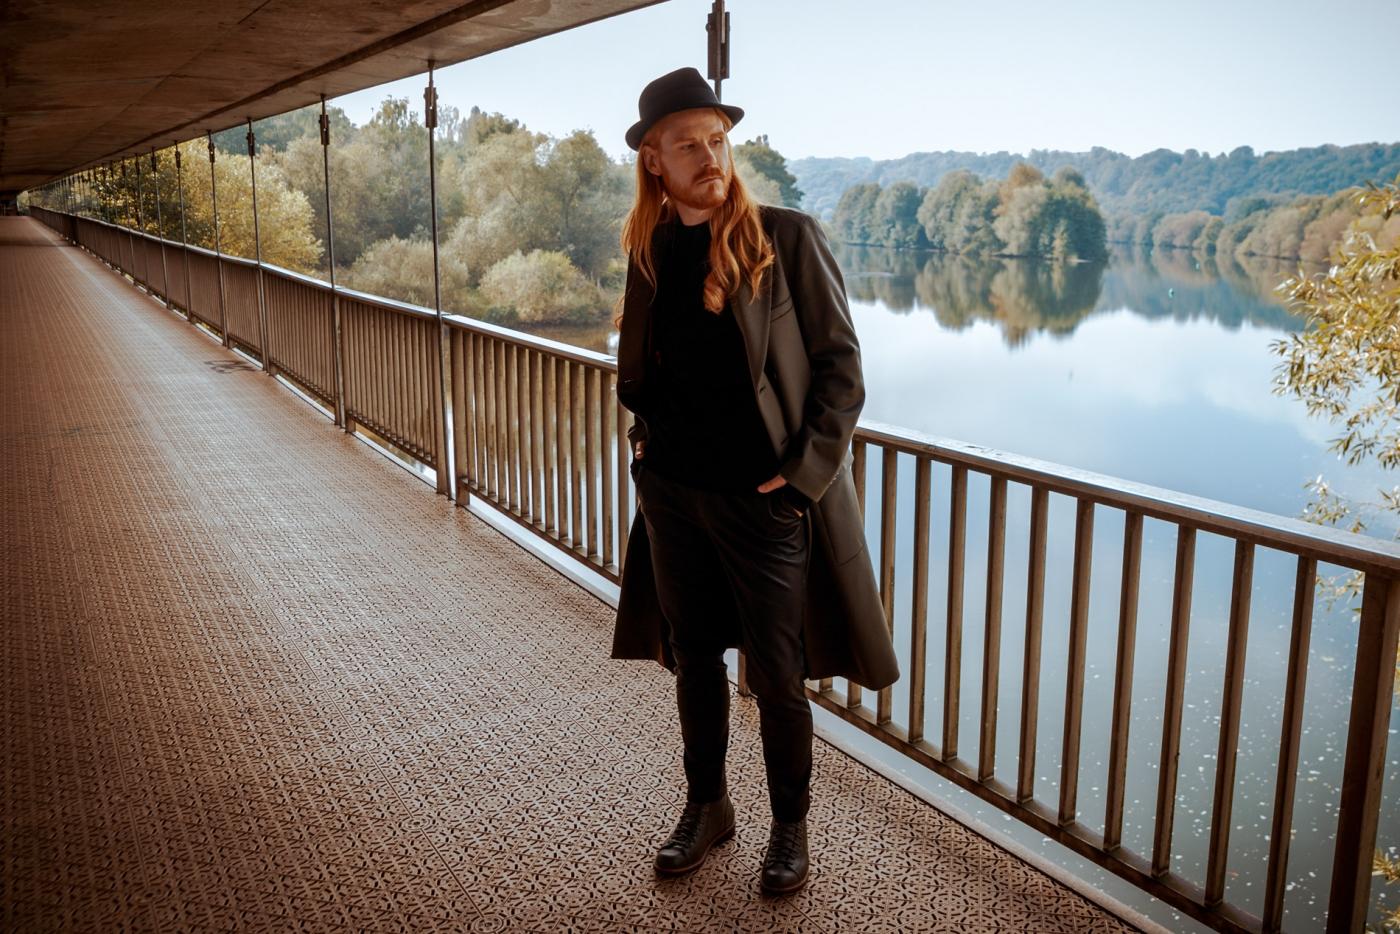 HUGO-Mantel-Herbstoutfit-Lederhose-Boots-Influencer-Malefashion-Blogger